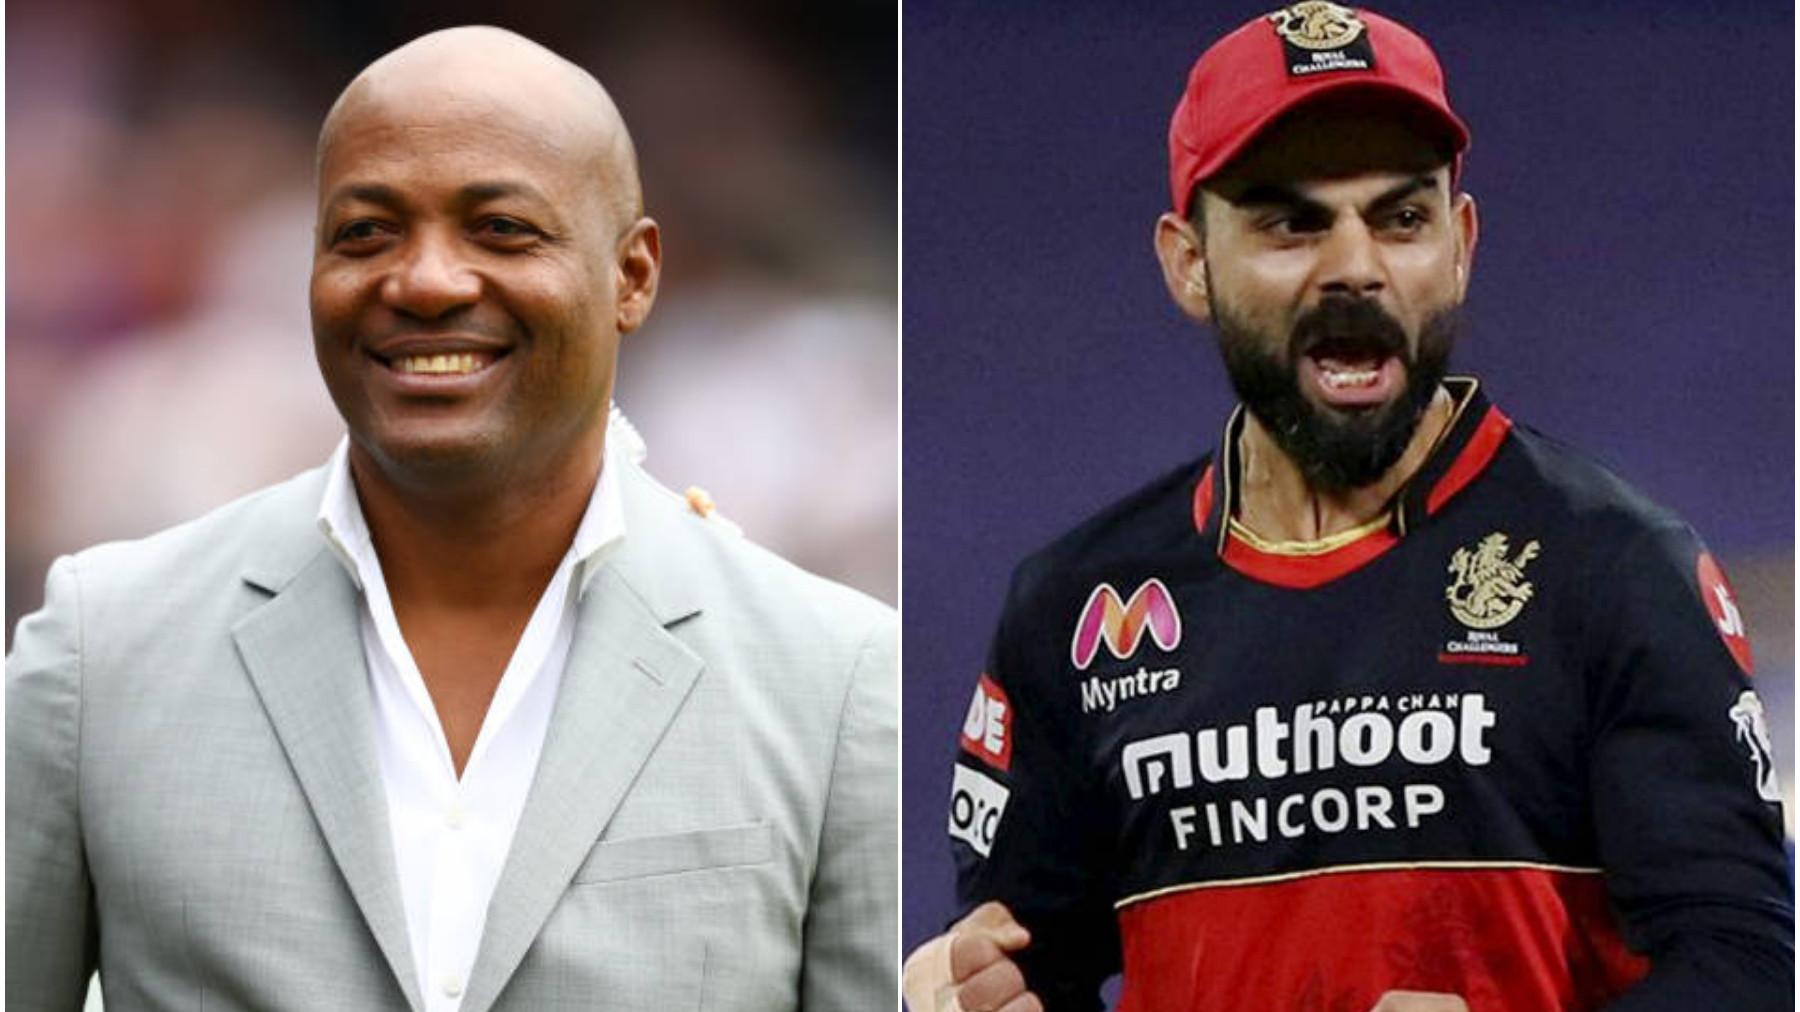 IPL 2021: Brian Lara supports Virat Kohli's decision to step down as RCB captain